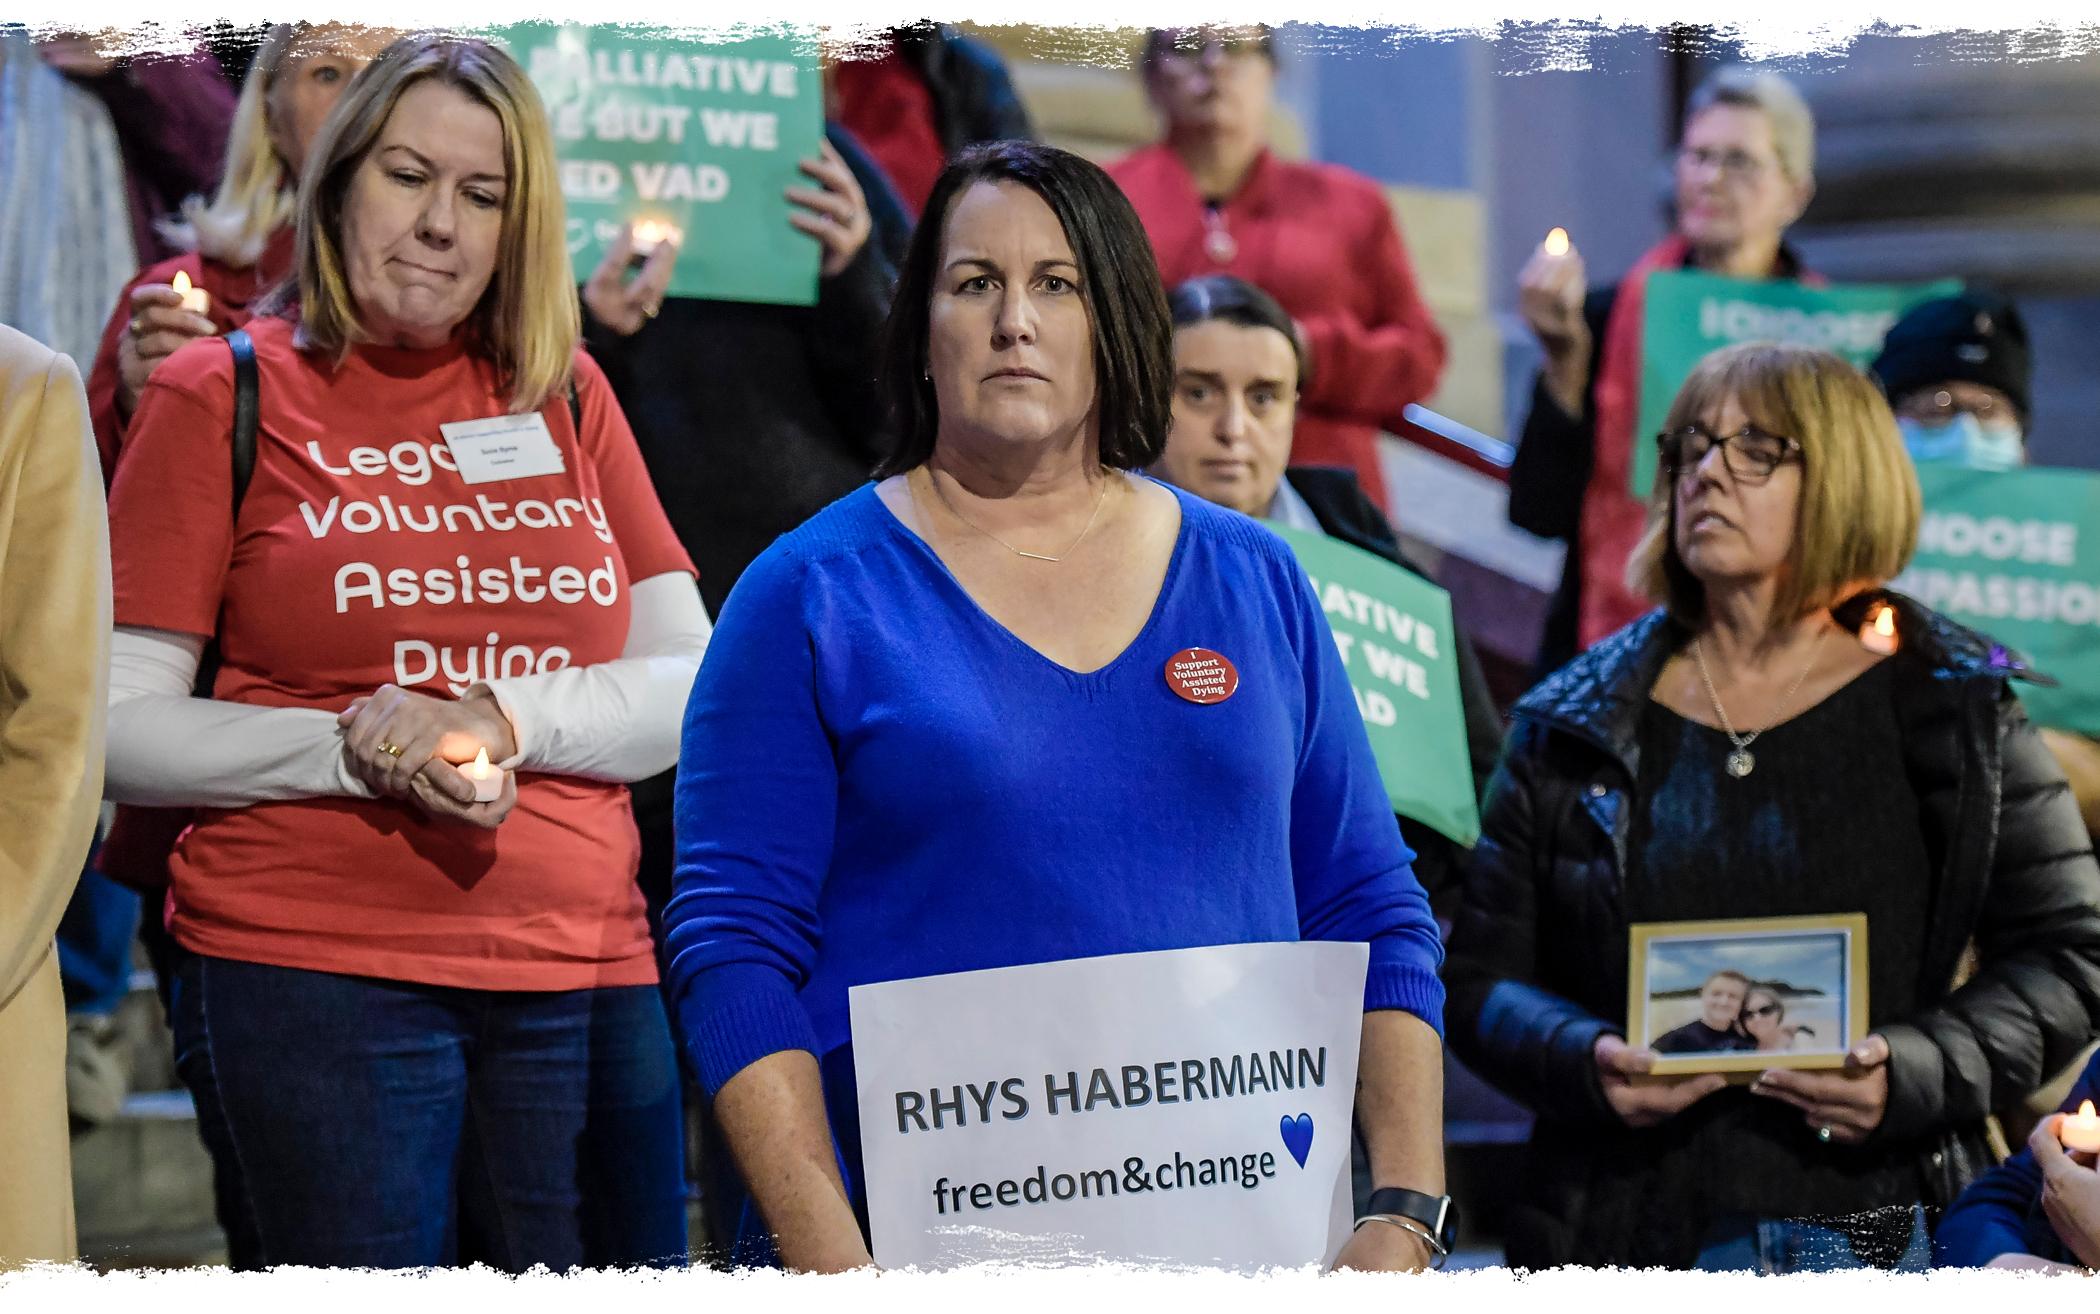 Liz Habermann hold a sign reading 'Rhys Habermann, freedom & change.'